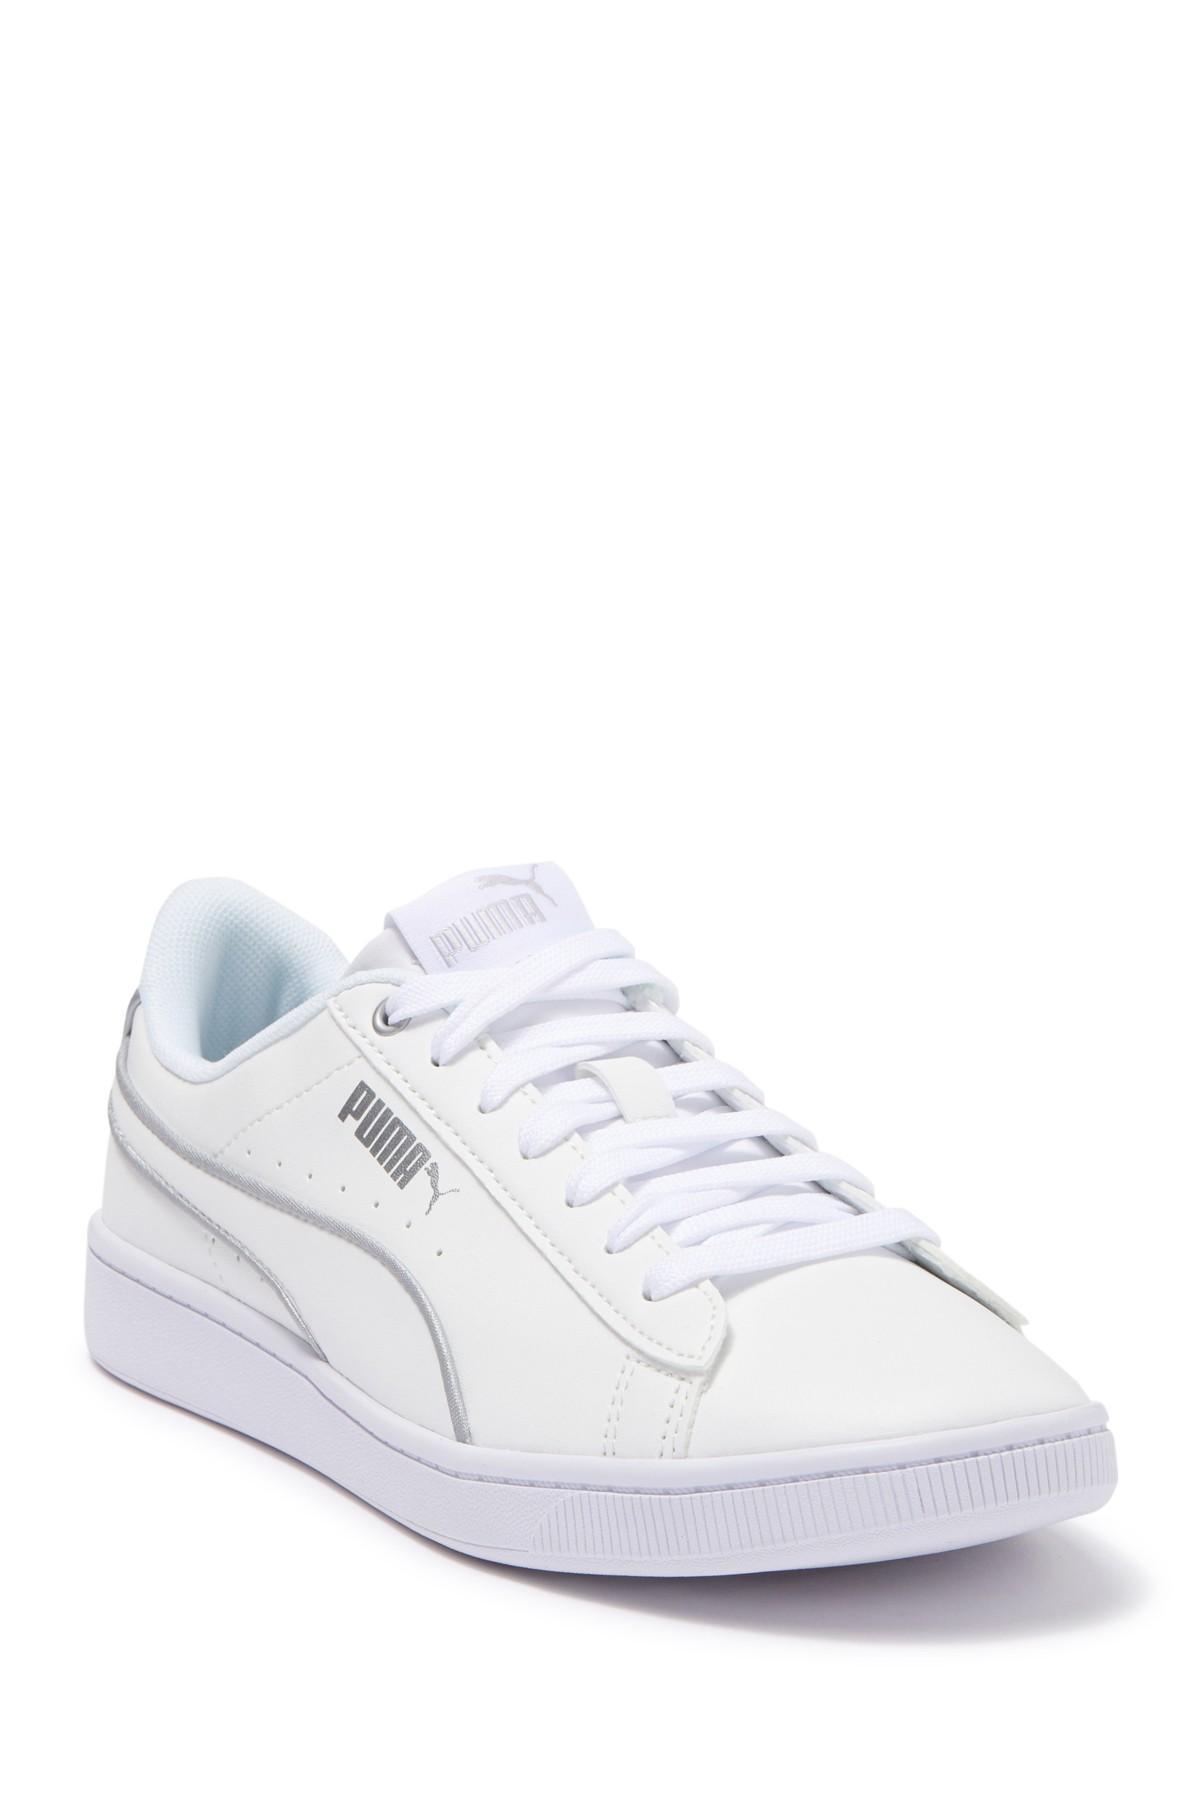 PUMA Leather Vikky V2 Hem Sneaker in